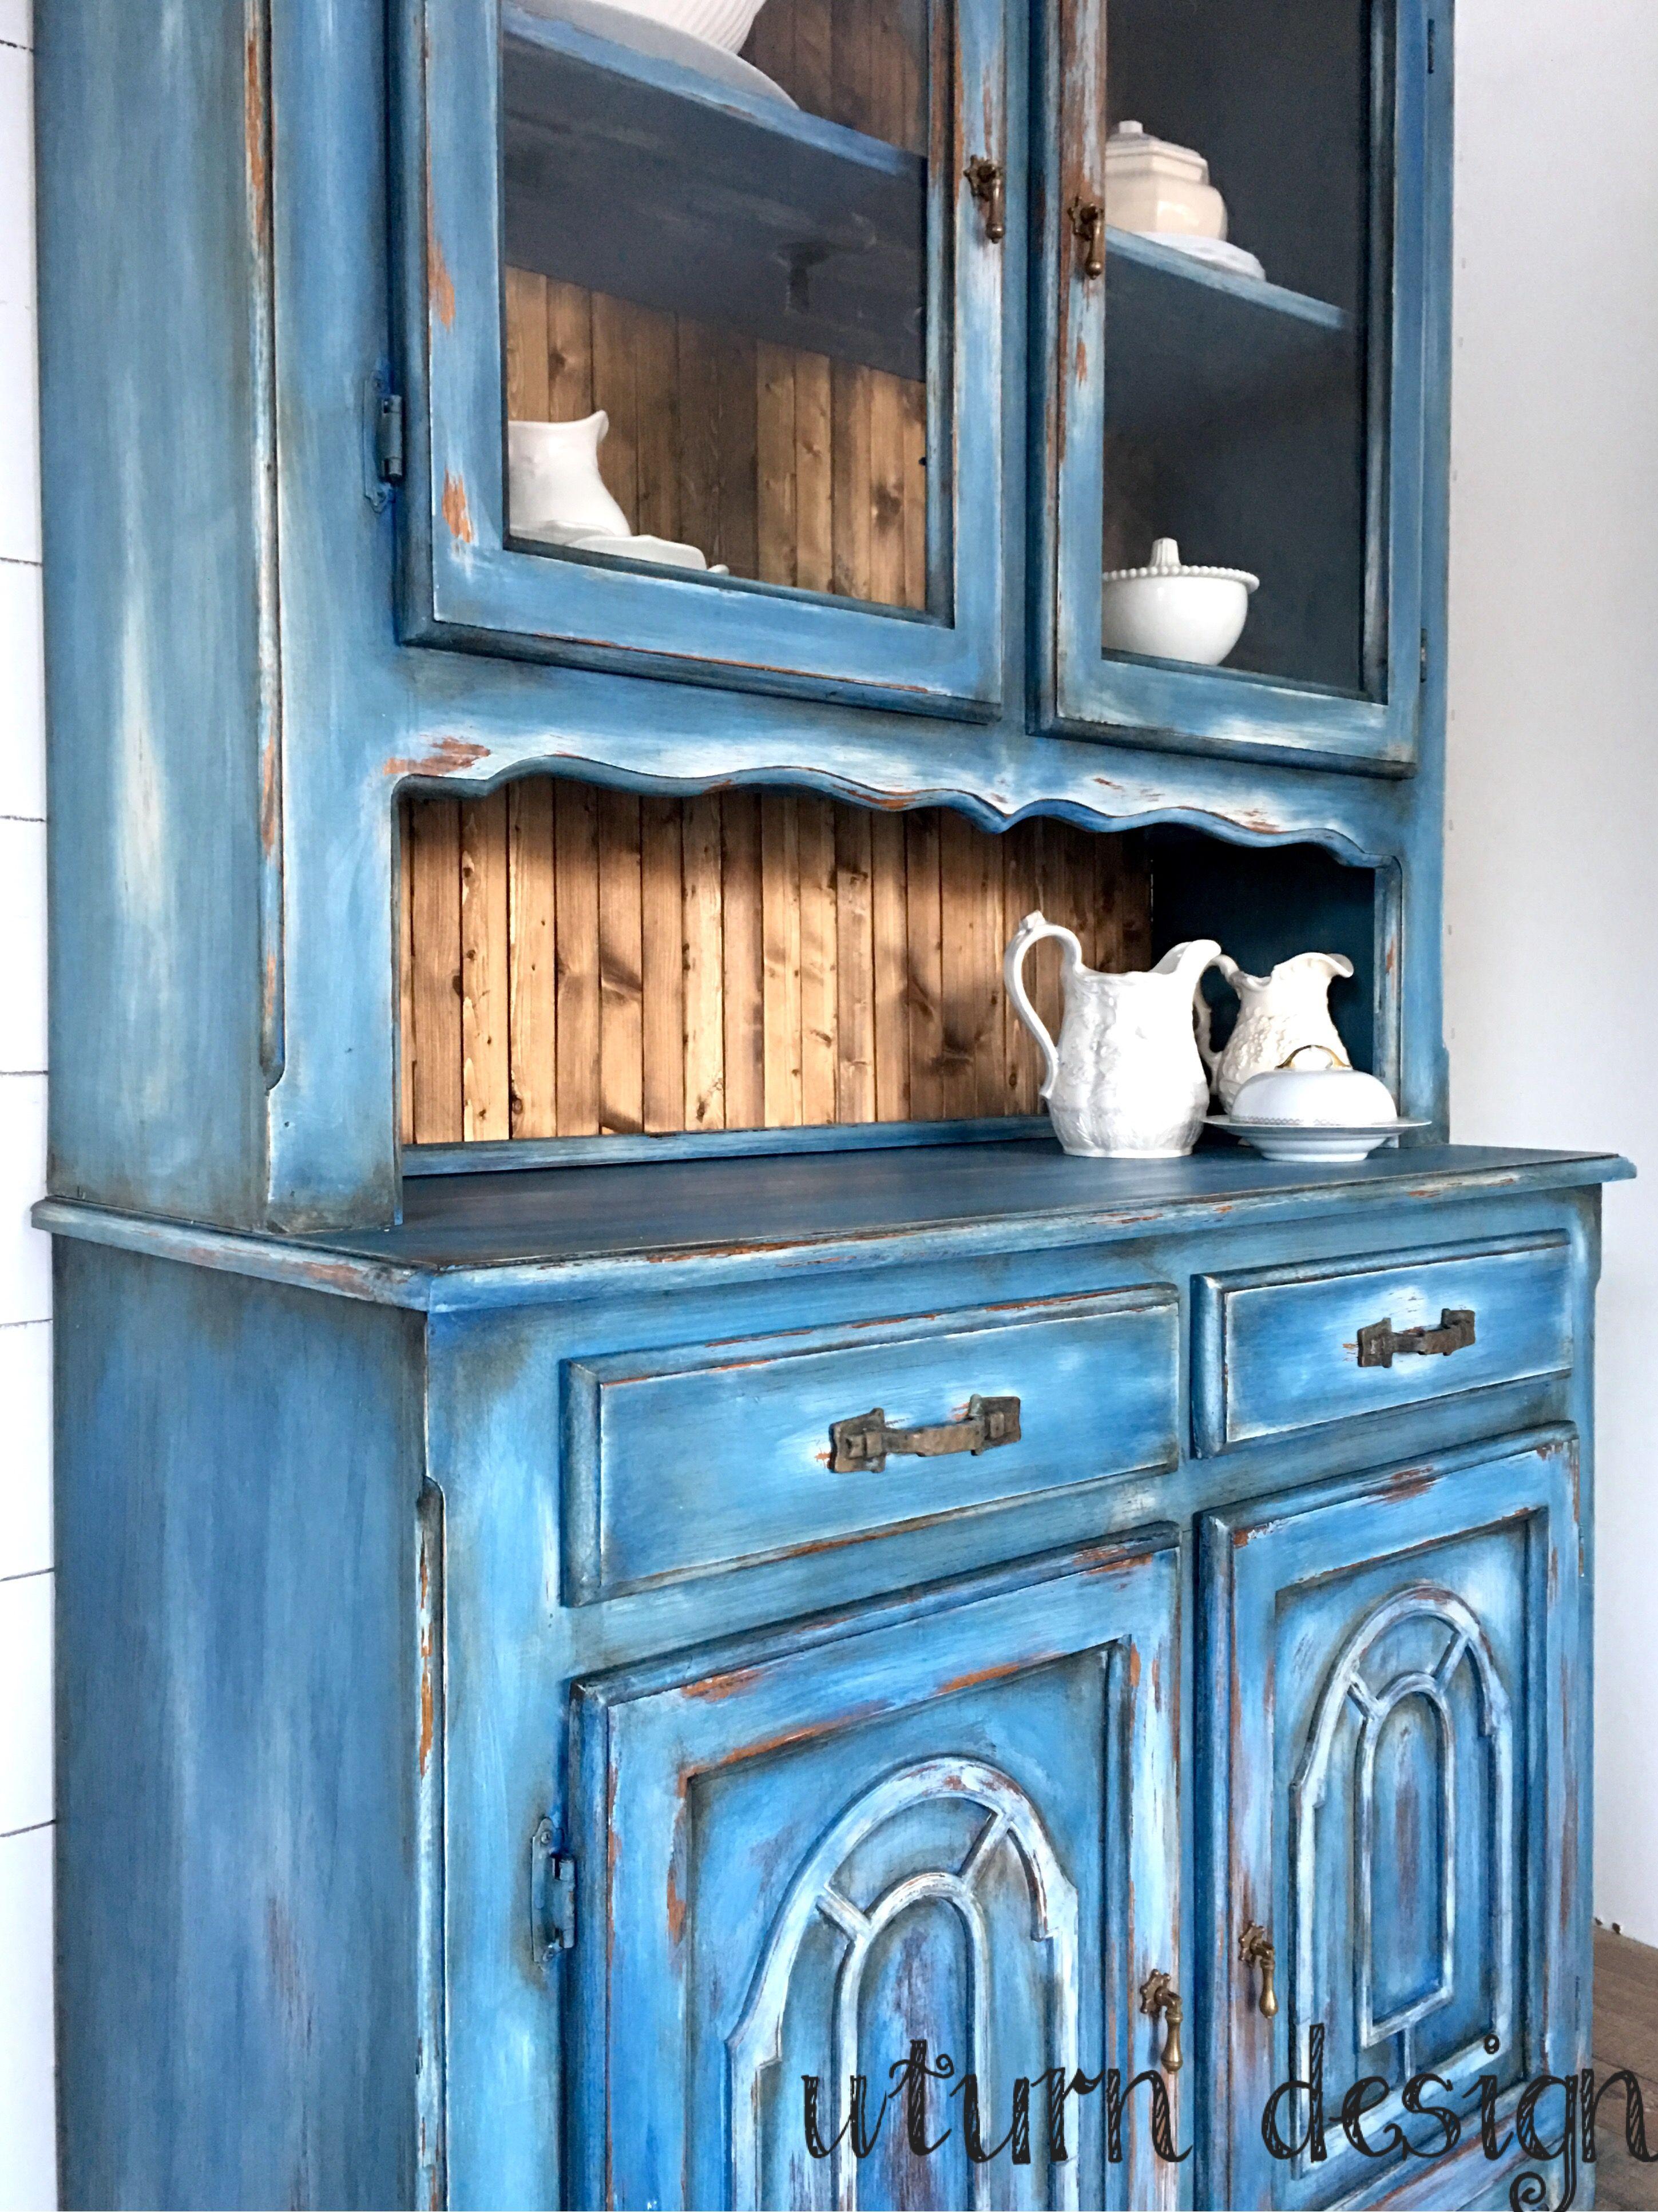 Farmhouse hutch By uturn design | UTurn design | Pinterest | Blue ...